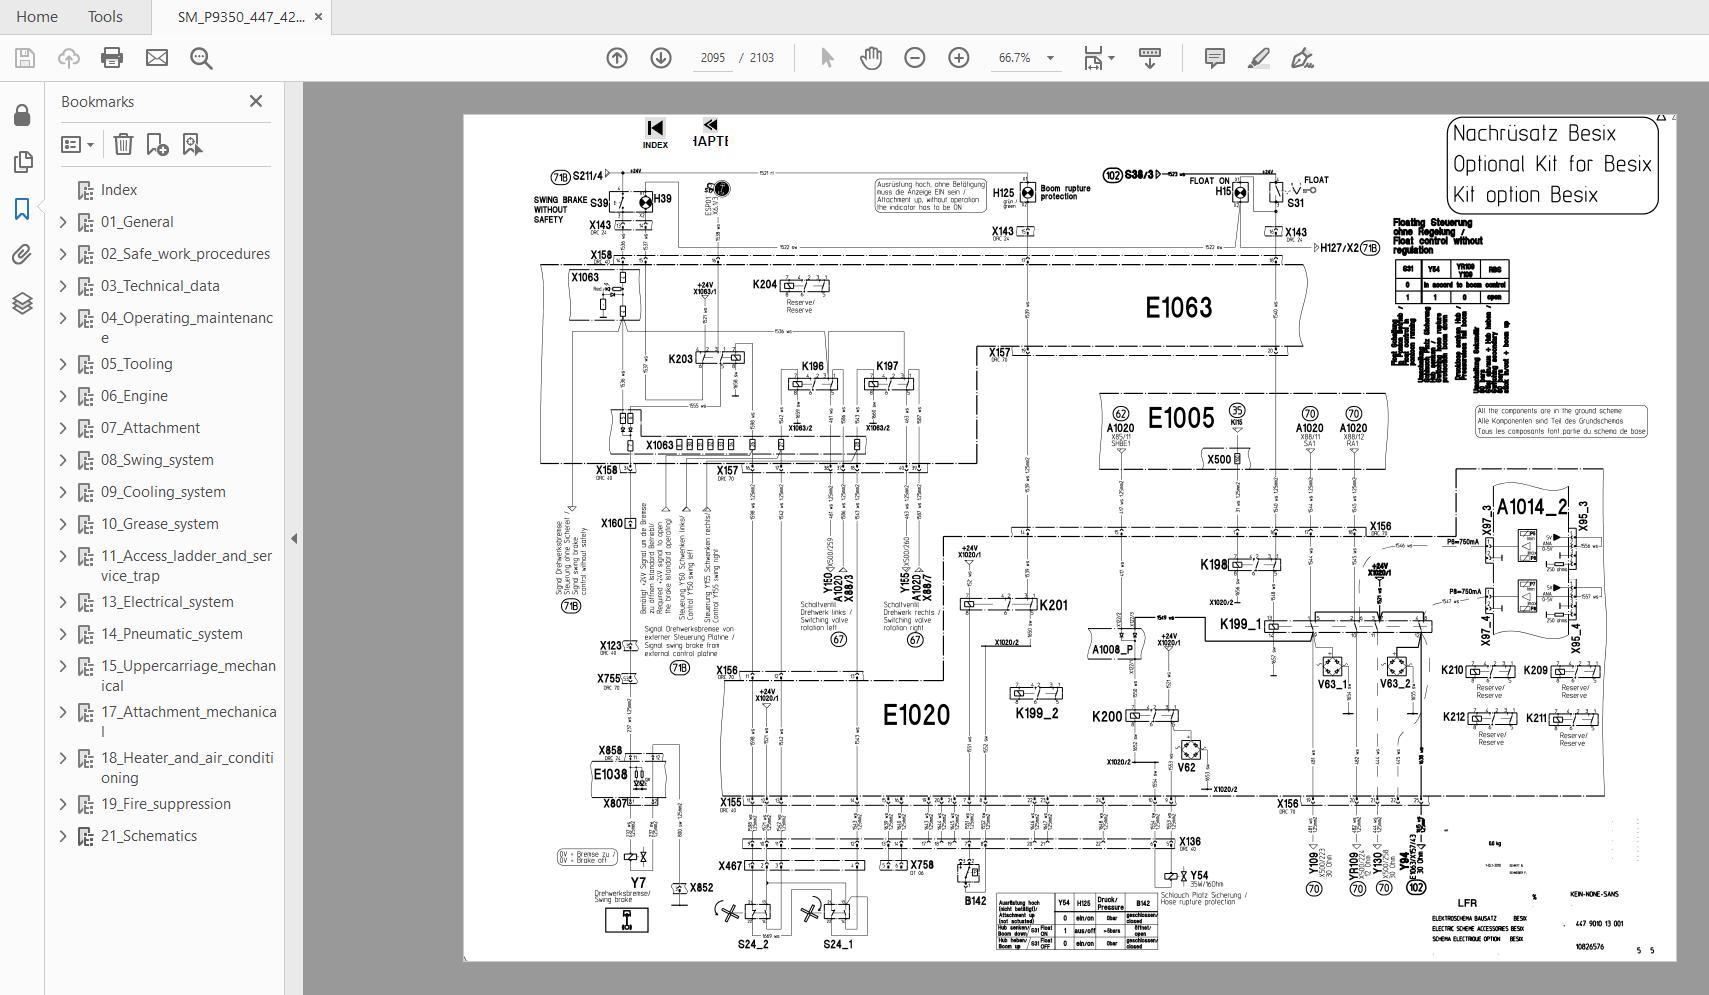 Liebherr_Mining_Excavators_Service_Manual_New_Updated_032020_16